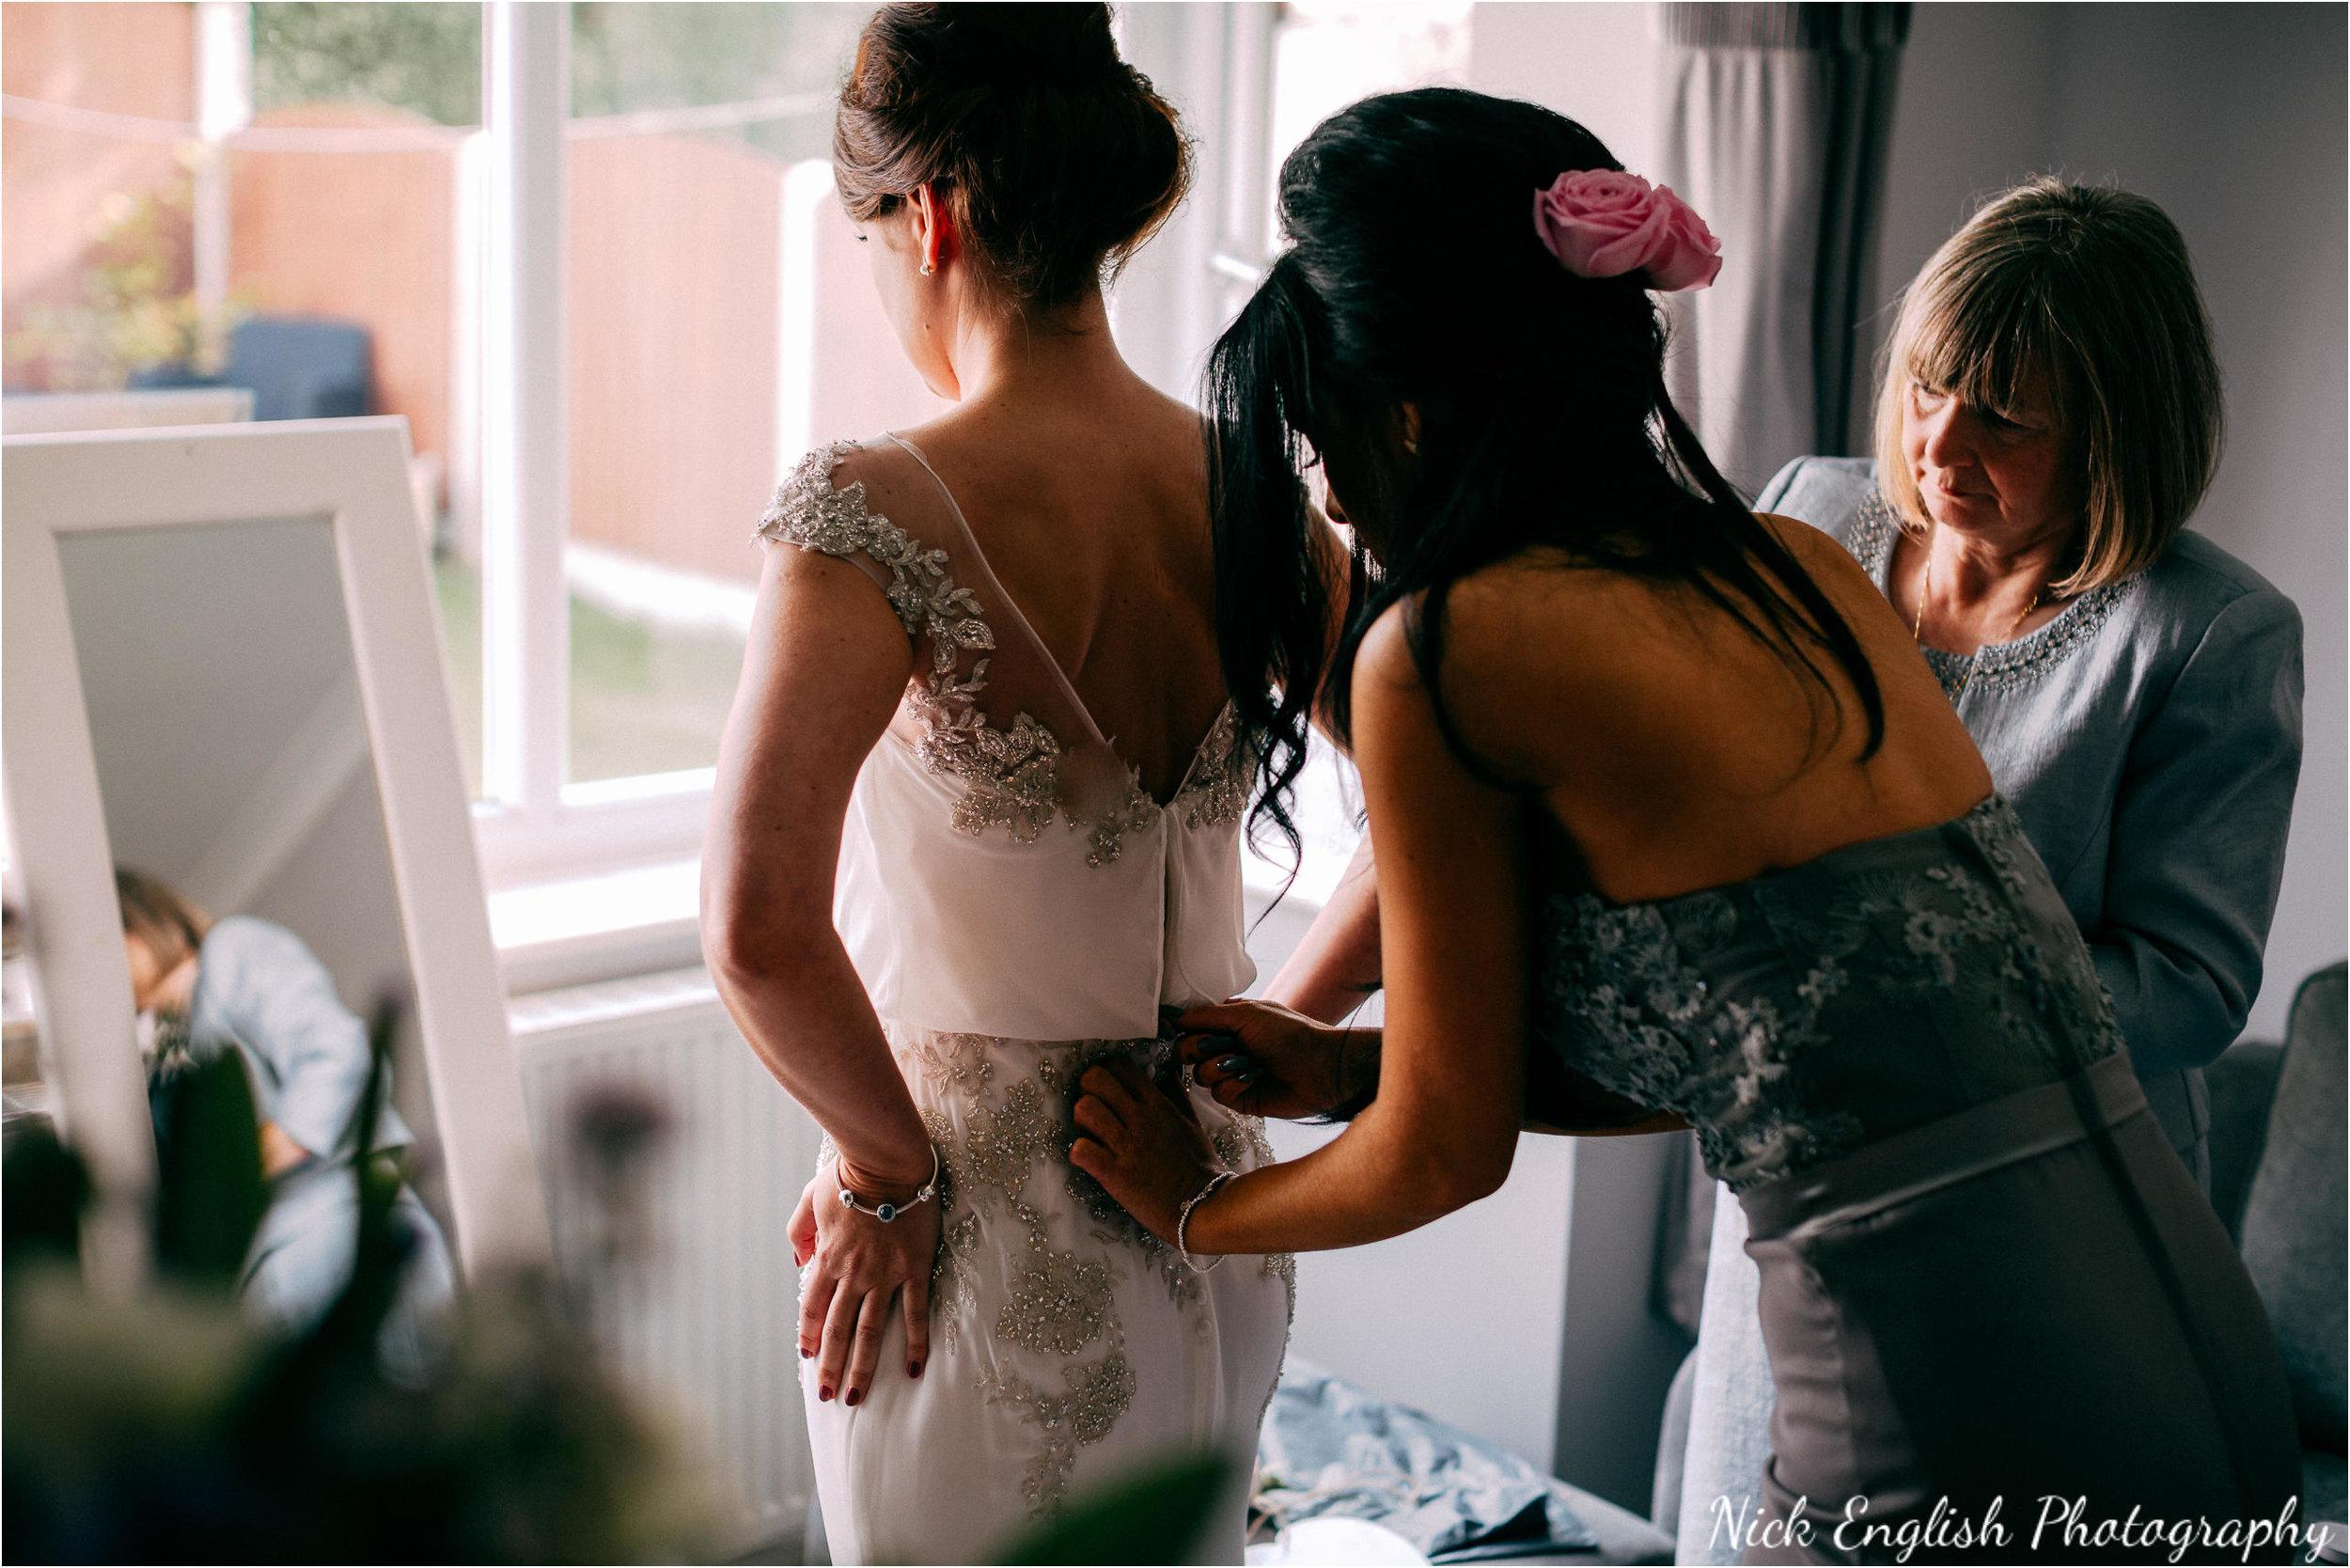 Stacey-Ash-Wedding-Photographs-Stanley-House-Preston-Lancashire-35.jpg